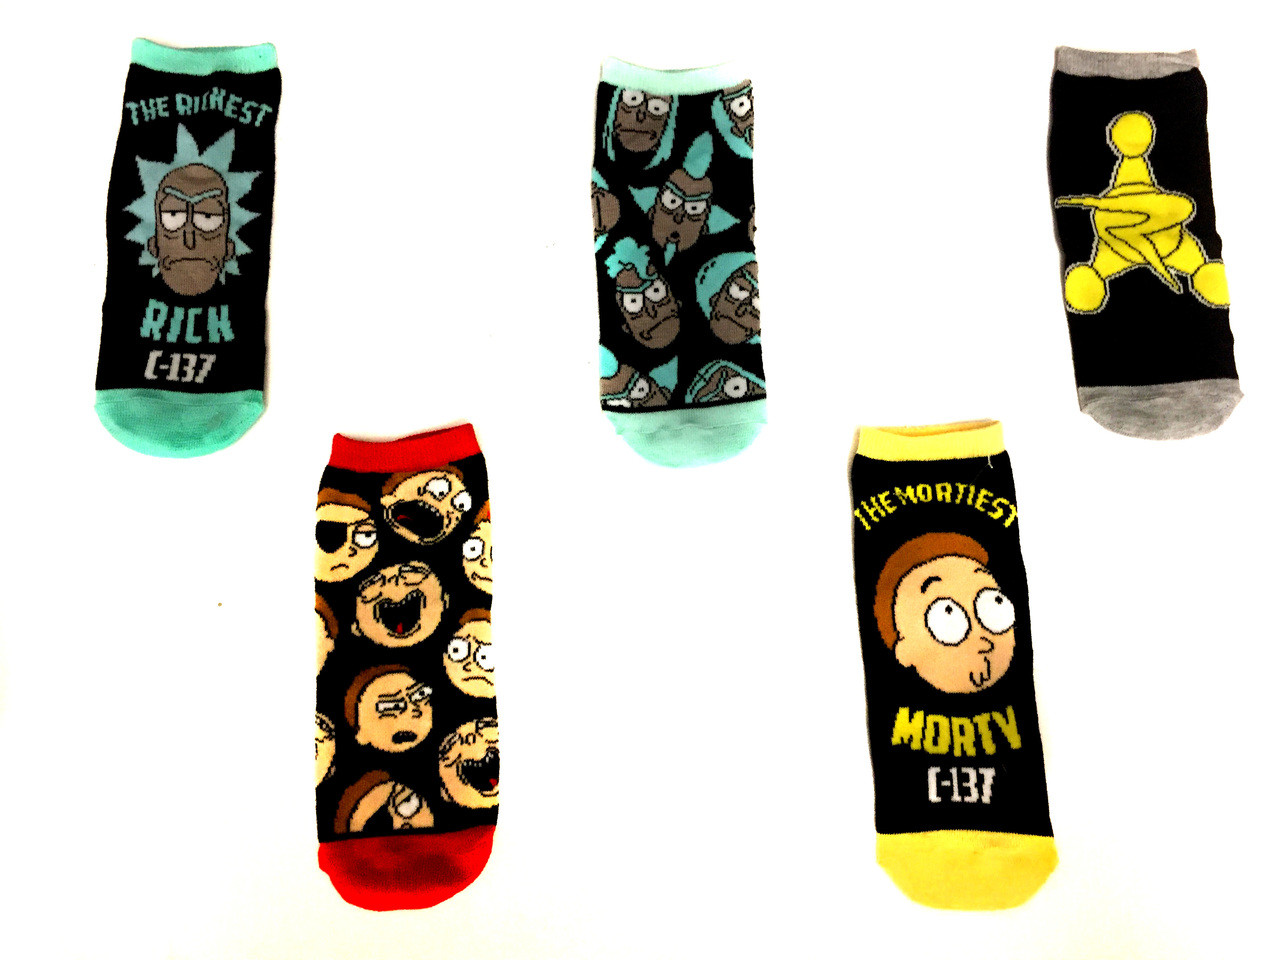 Cut - Low Rick Characters Nerdkungfu And com Pack 5 Socks Morty